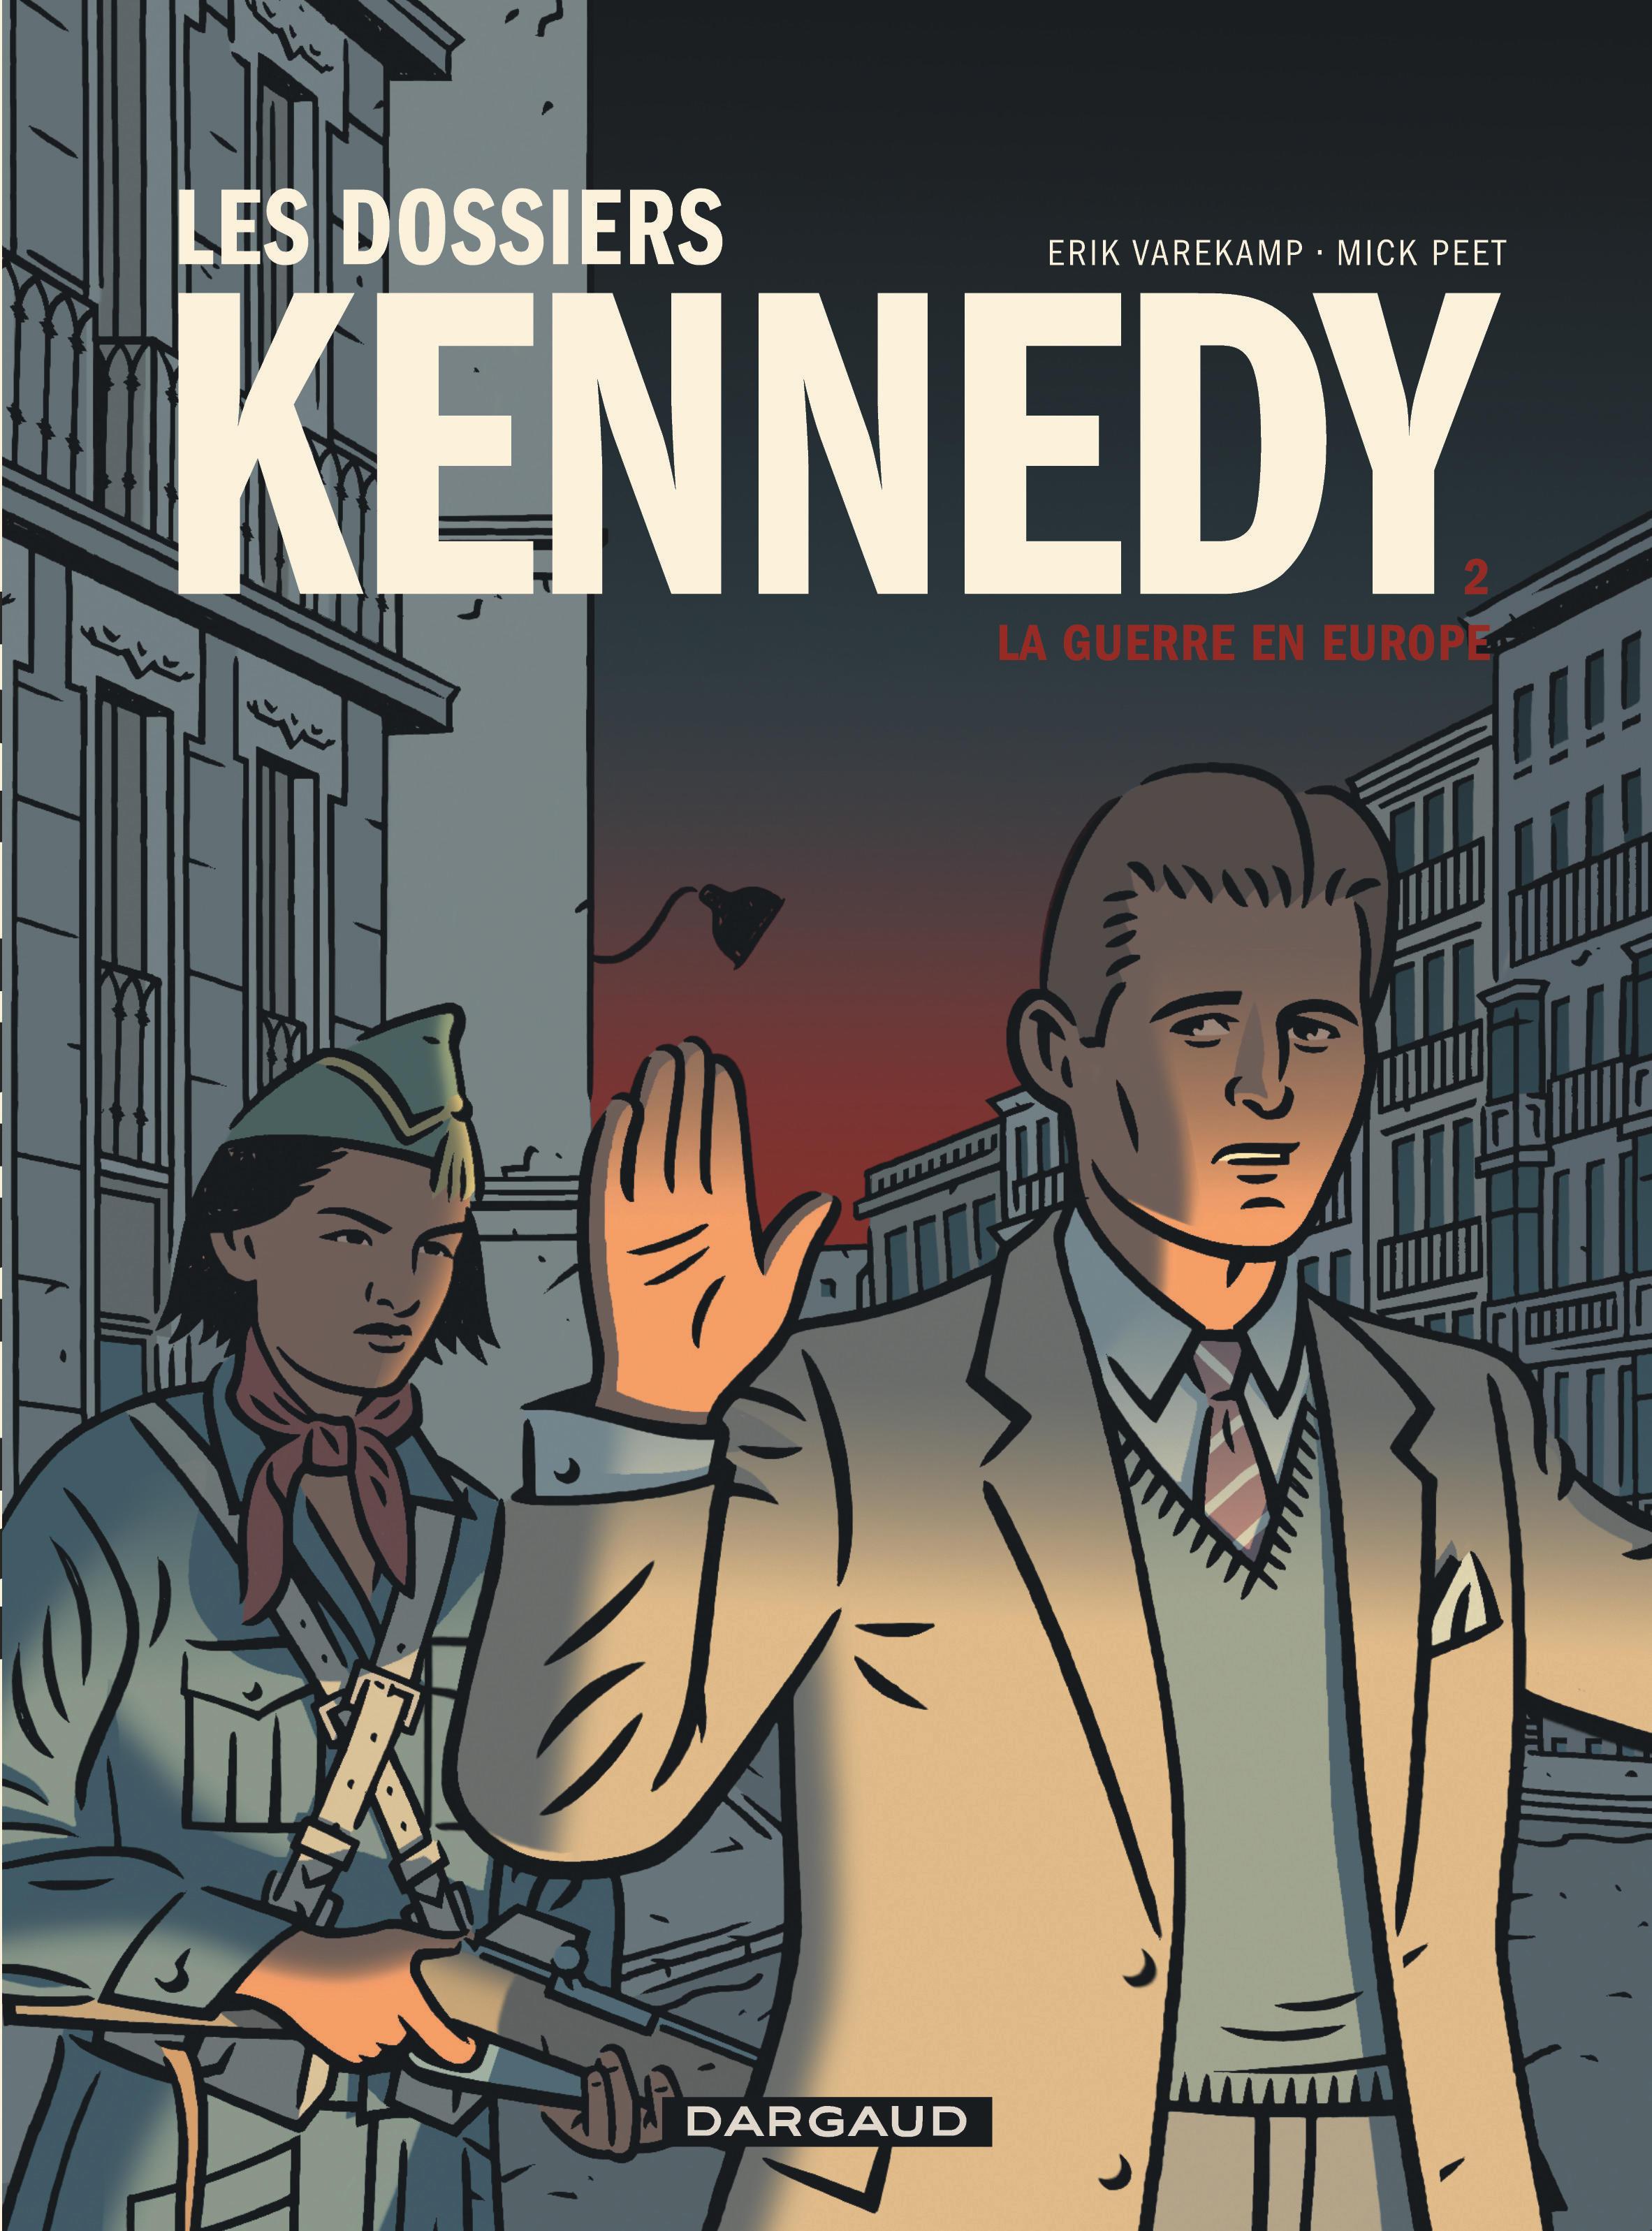 LES DOSSIERS KENNEDY - DOSSIERS KENNEDY (LES) - TOME 2 - GUERRE EN EUROPE (LA)